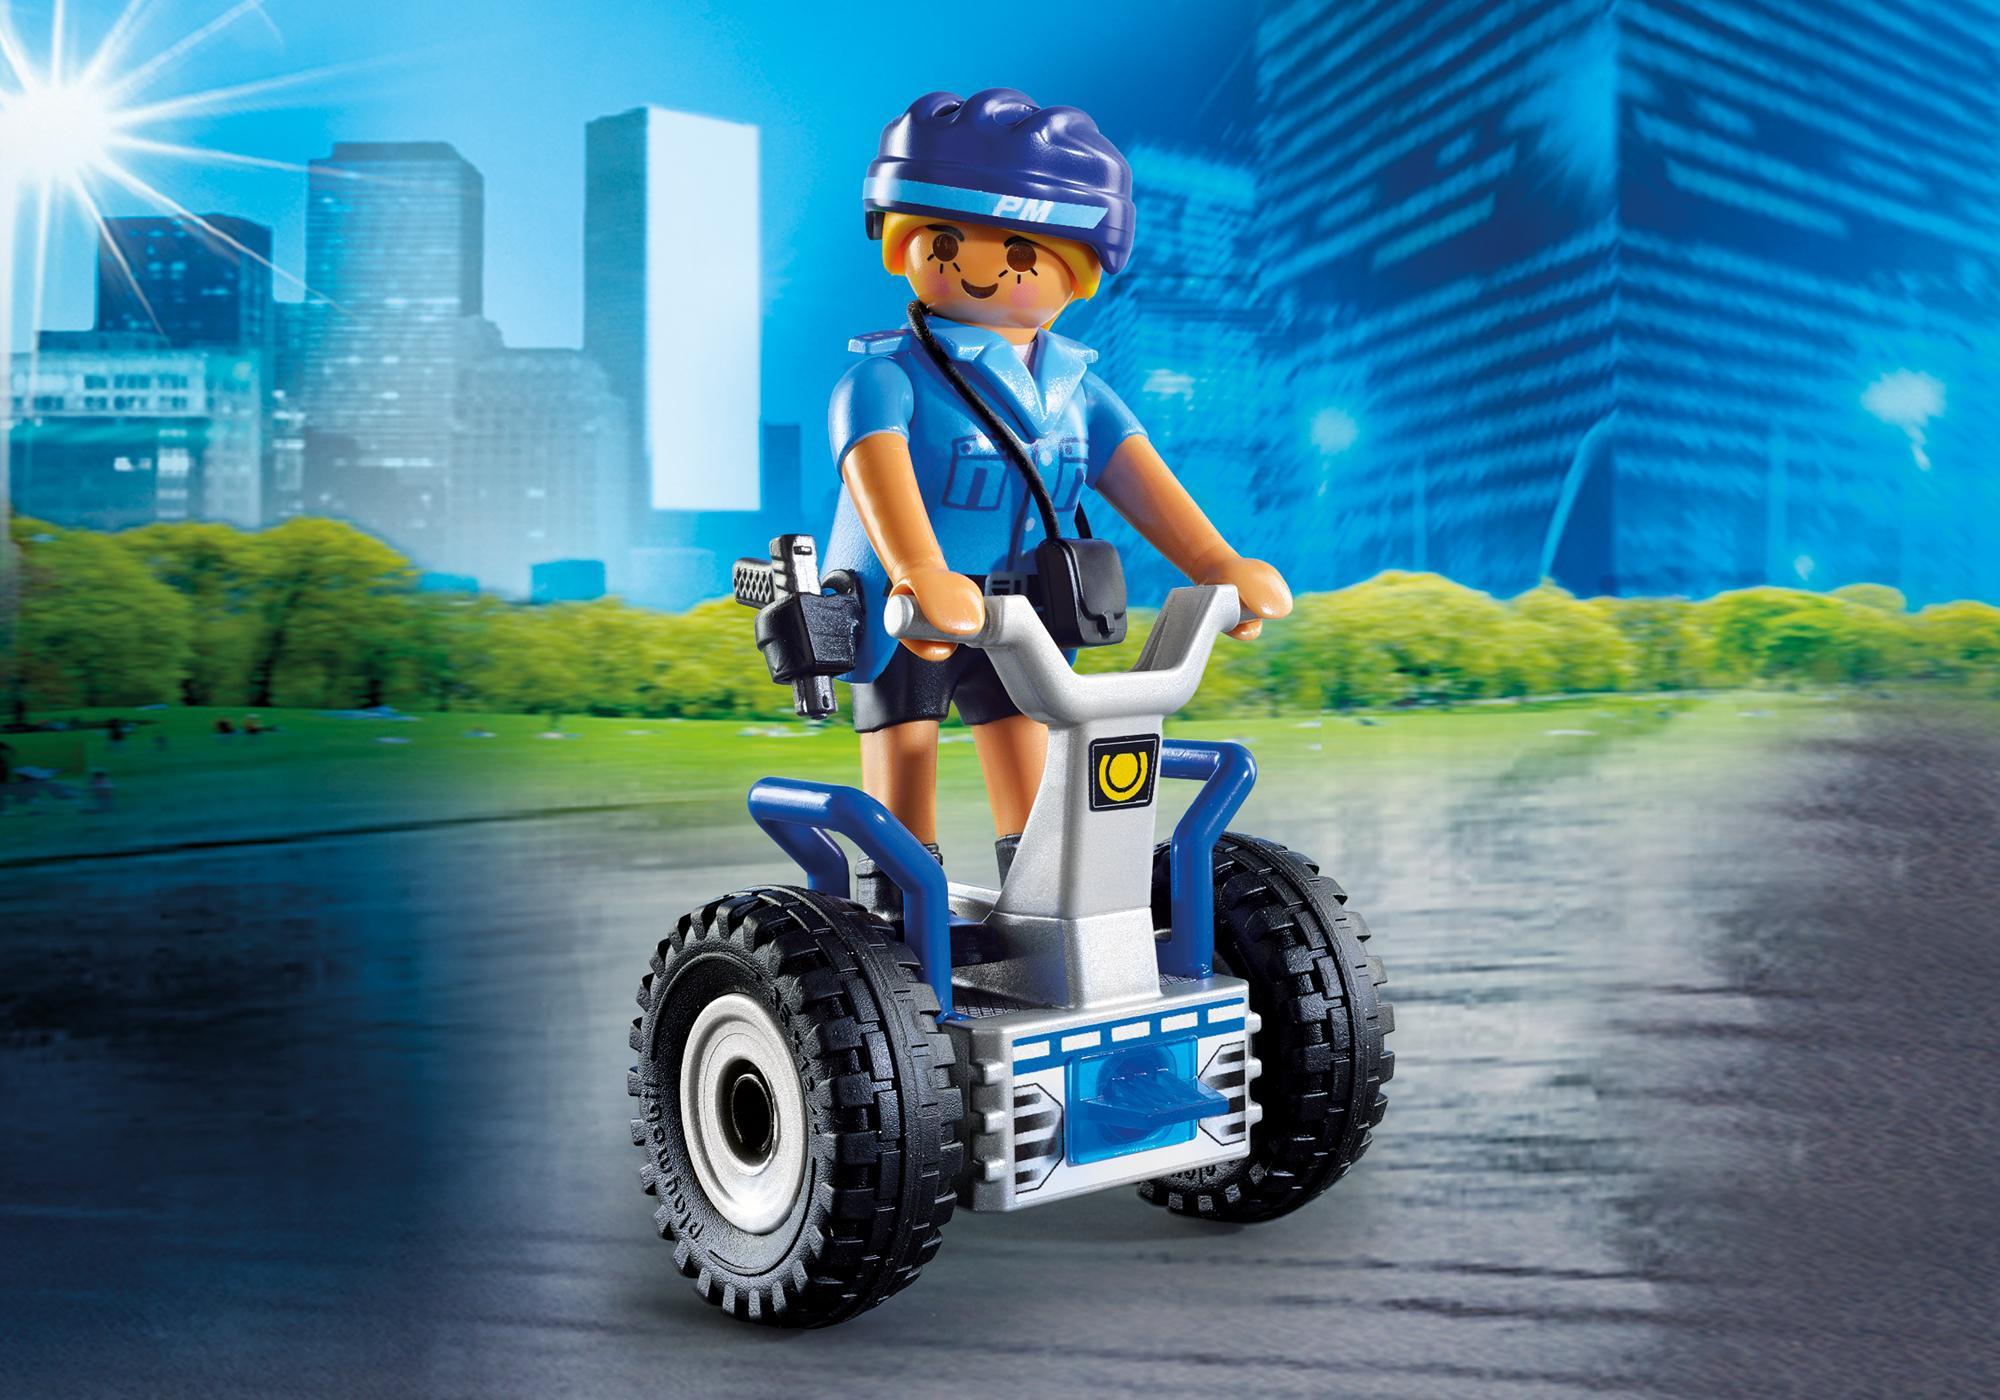 http://media.playmobil.com/i/playmobil/6877_product_detail/Policía con Balance Racer